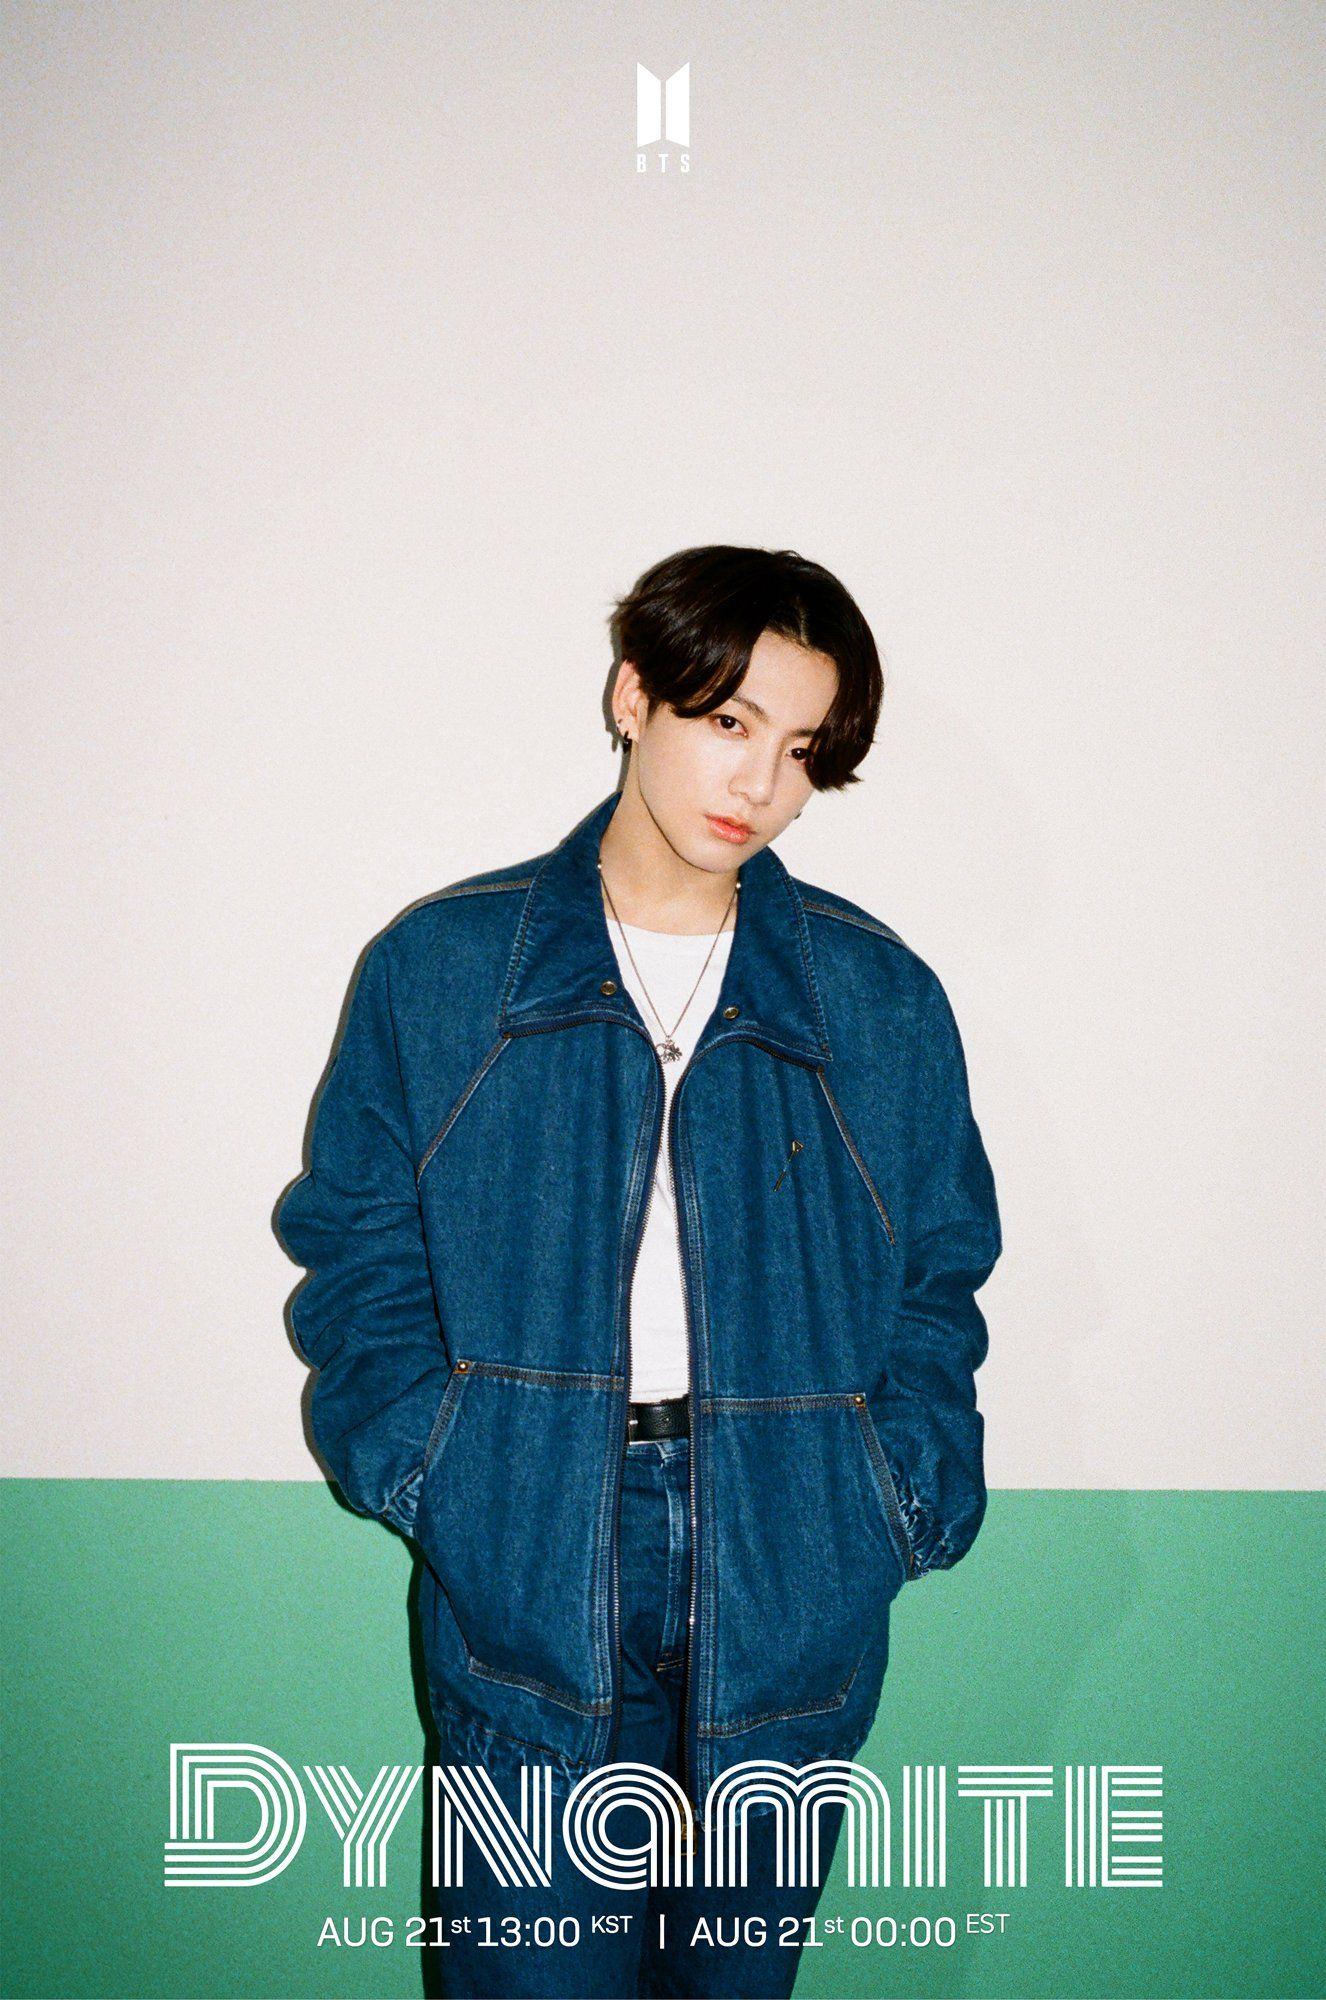 Bighit Entertainment On Twitter Jungkook Bts Jungkook Jeon Jungkook Bts jungkook dynamite wallpaper